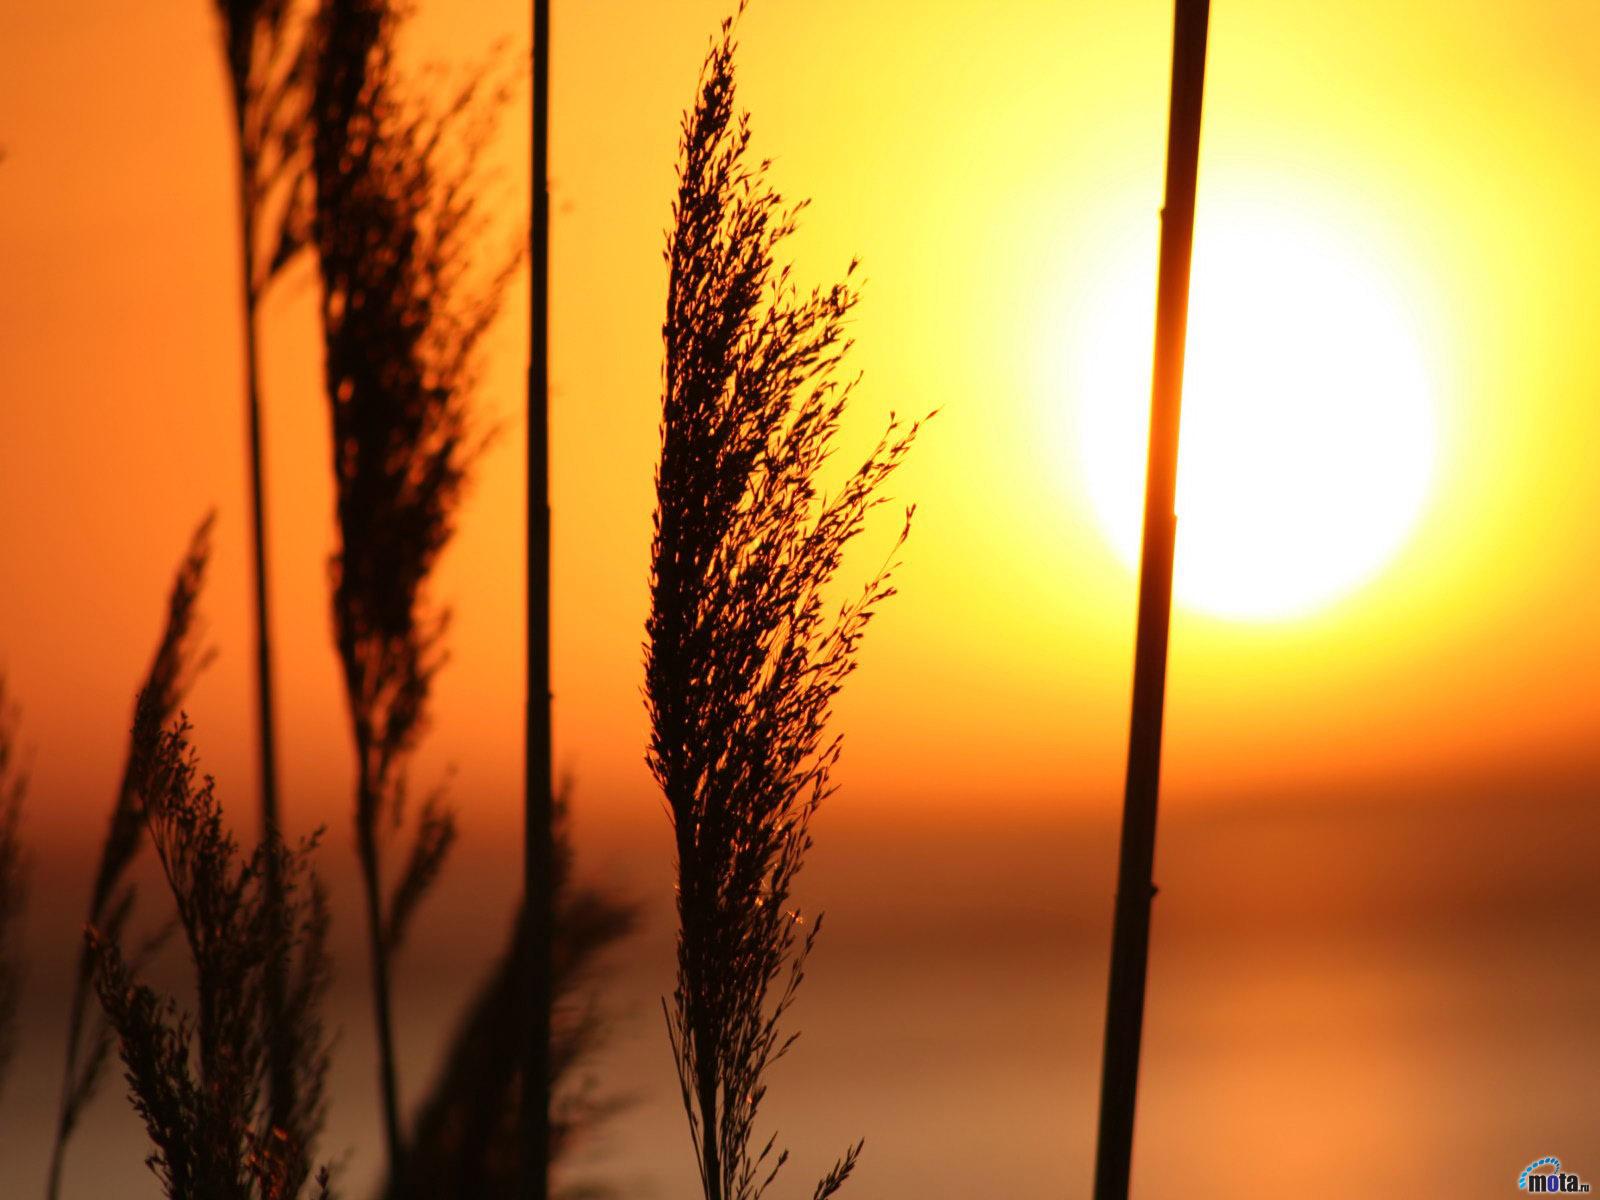 Backgrounds: 5 Beautiful Nature